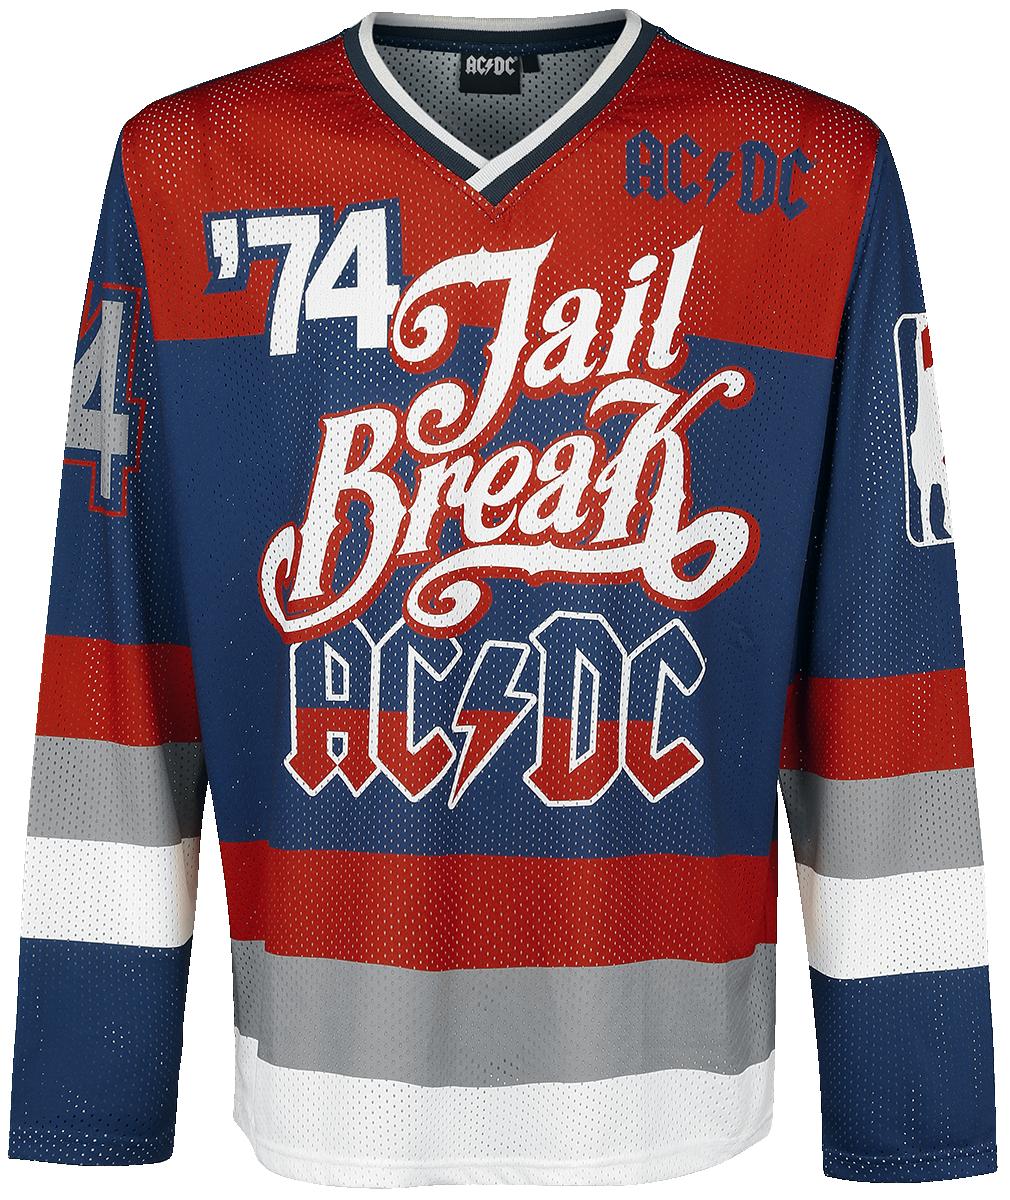 AC/DC - Jail Breakers '74 - Longsleeve - multicolour image